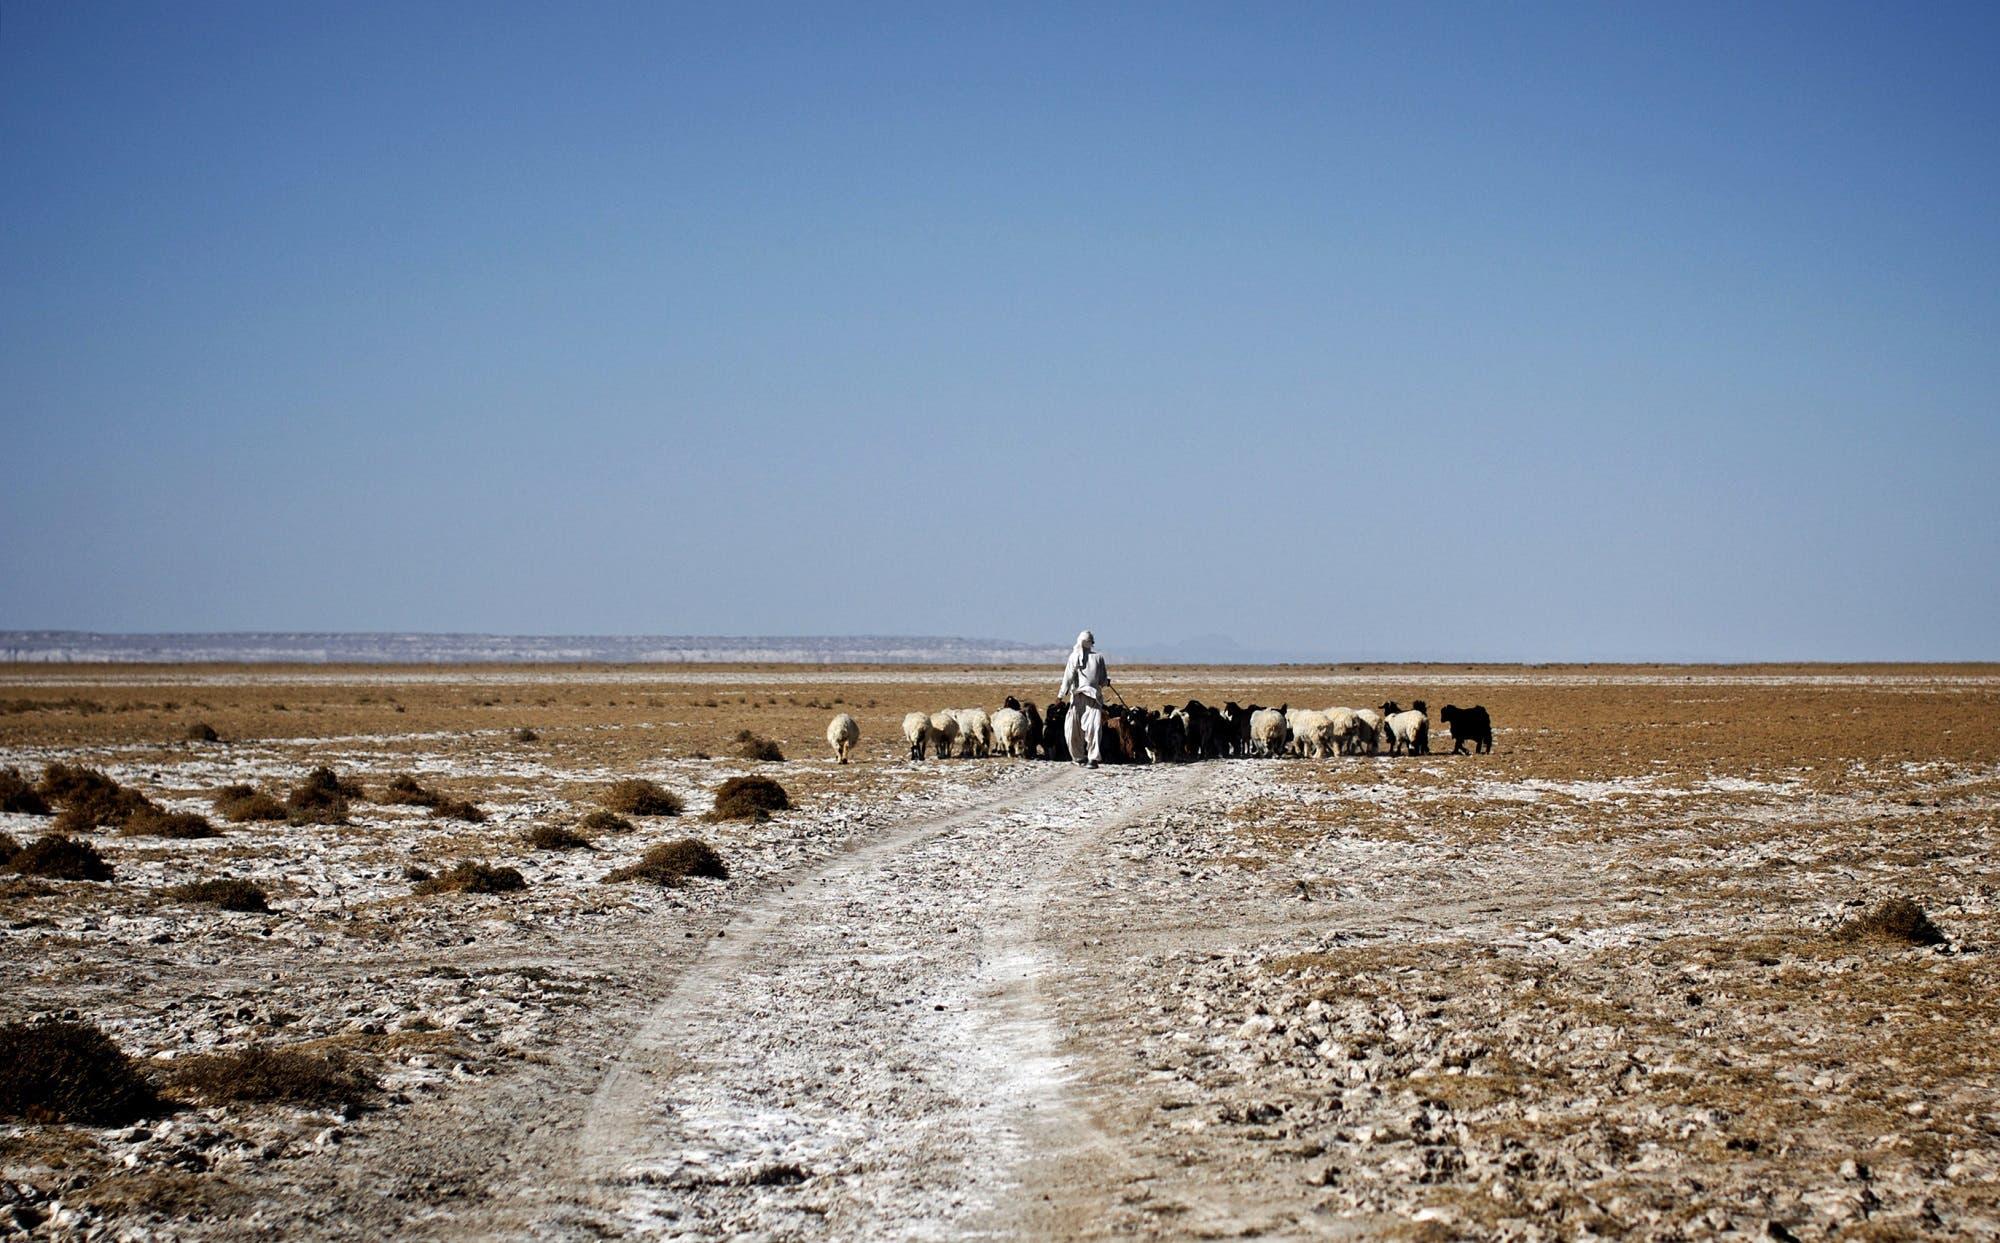 An Iranian shepherd walks his herd in the middle of Hamoon wetland near the Zabol town, in Iran on February 2, 2015. (AFP)